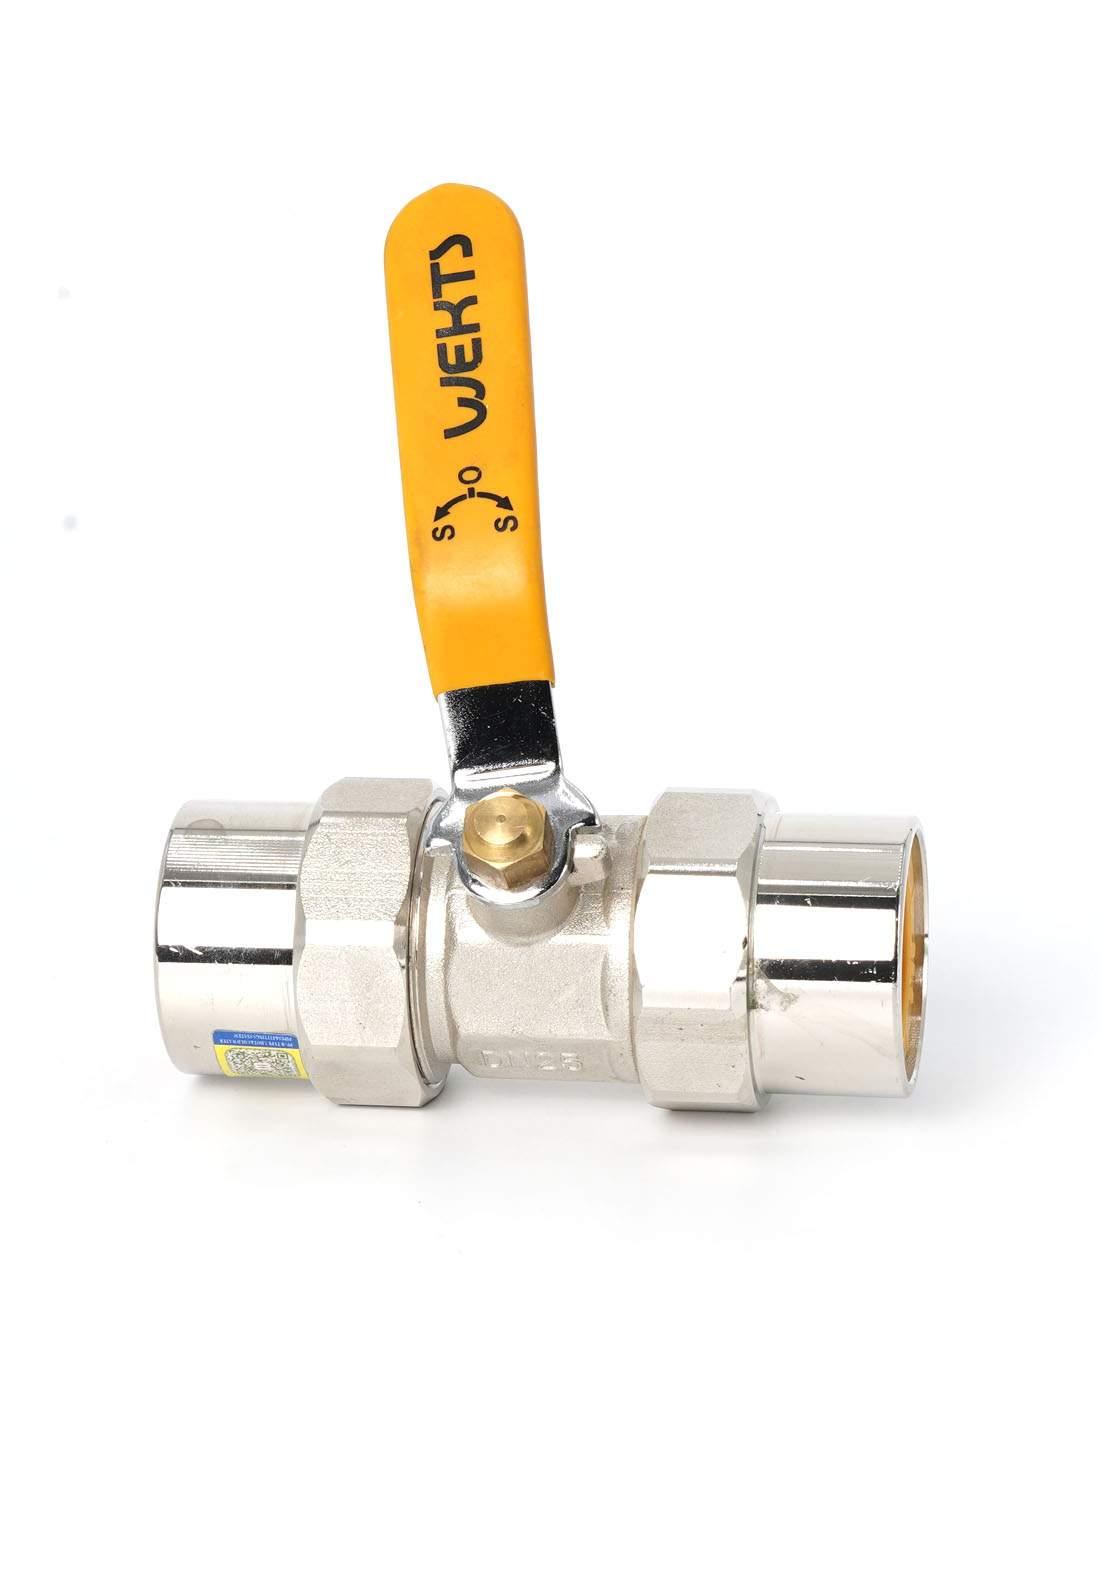 Wekts 5529 Double Chrome Flat Lock 50 mm قفل انابيب مزدوج مسطح لأنابيب المياه